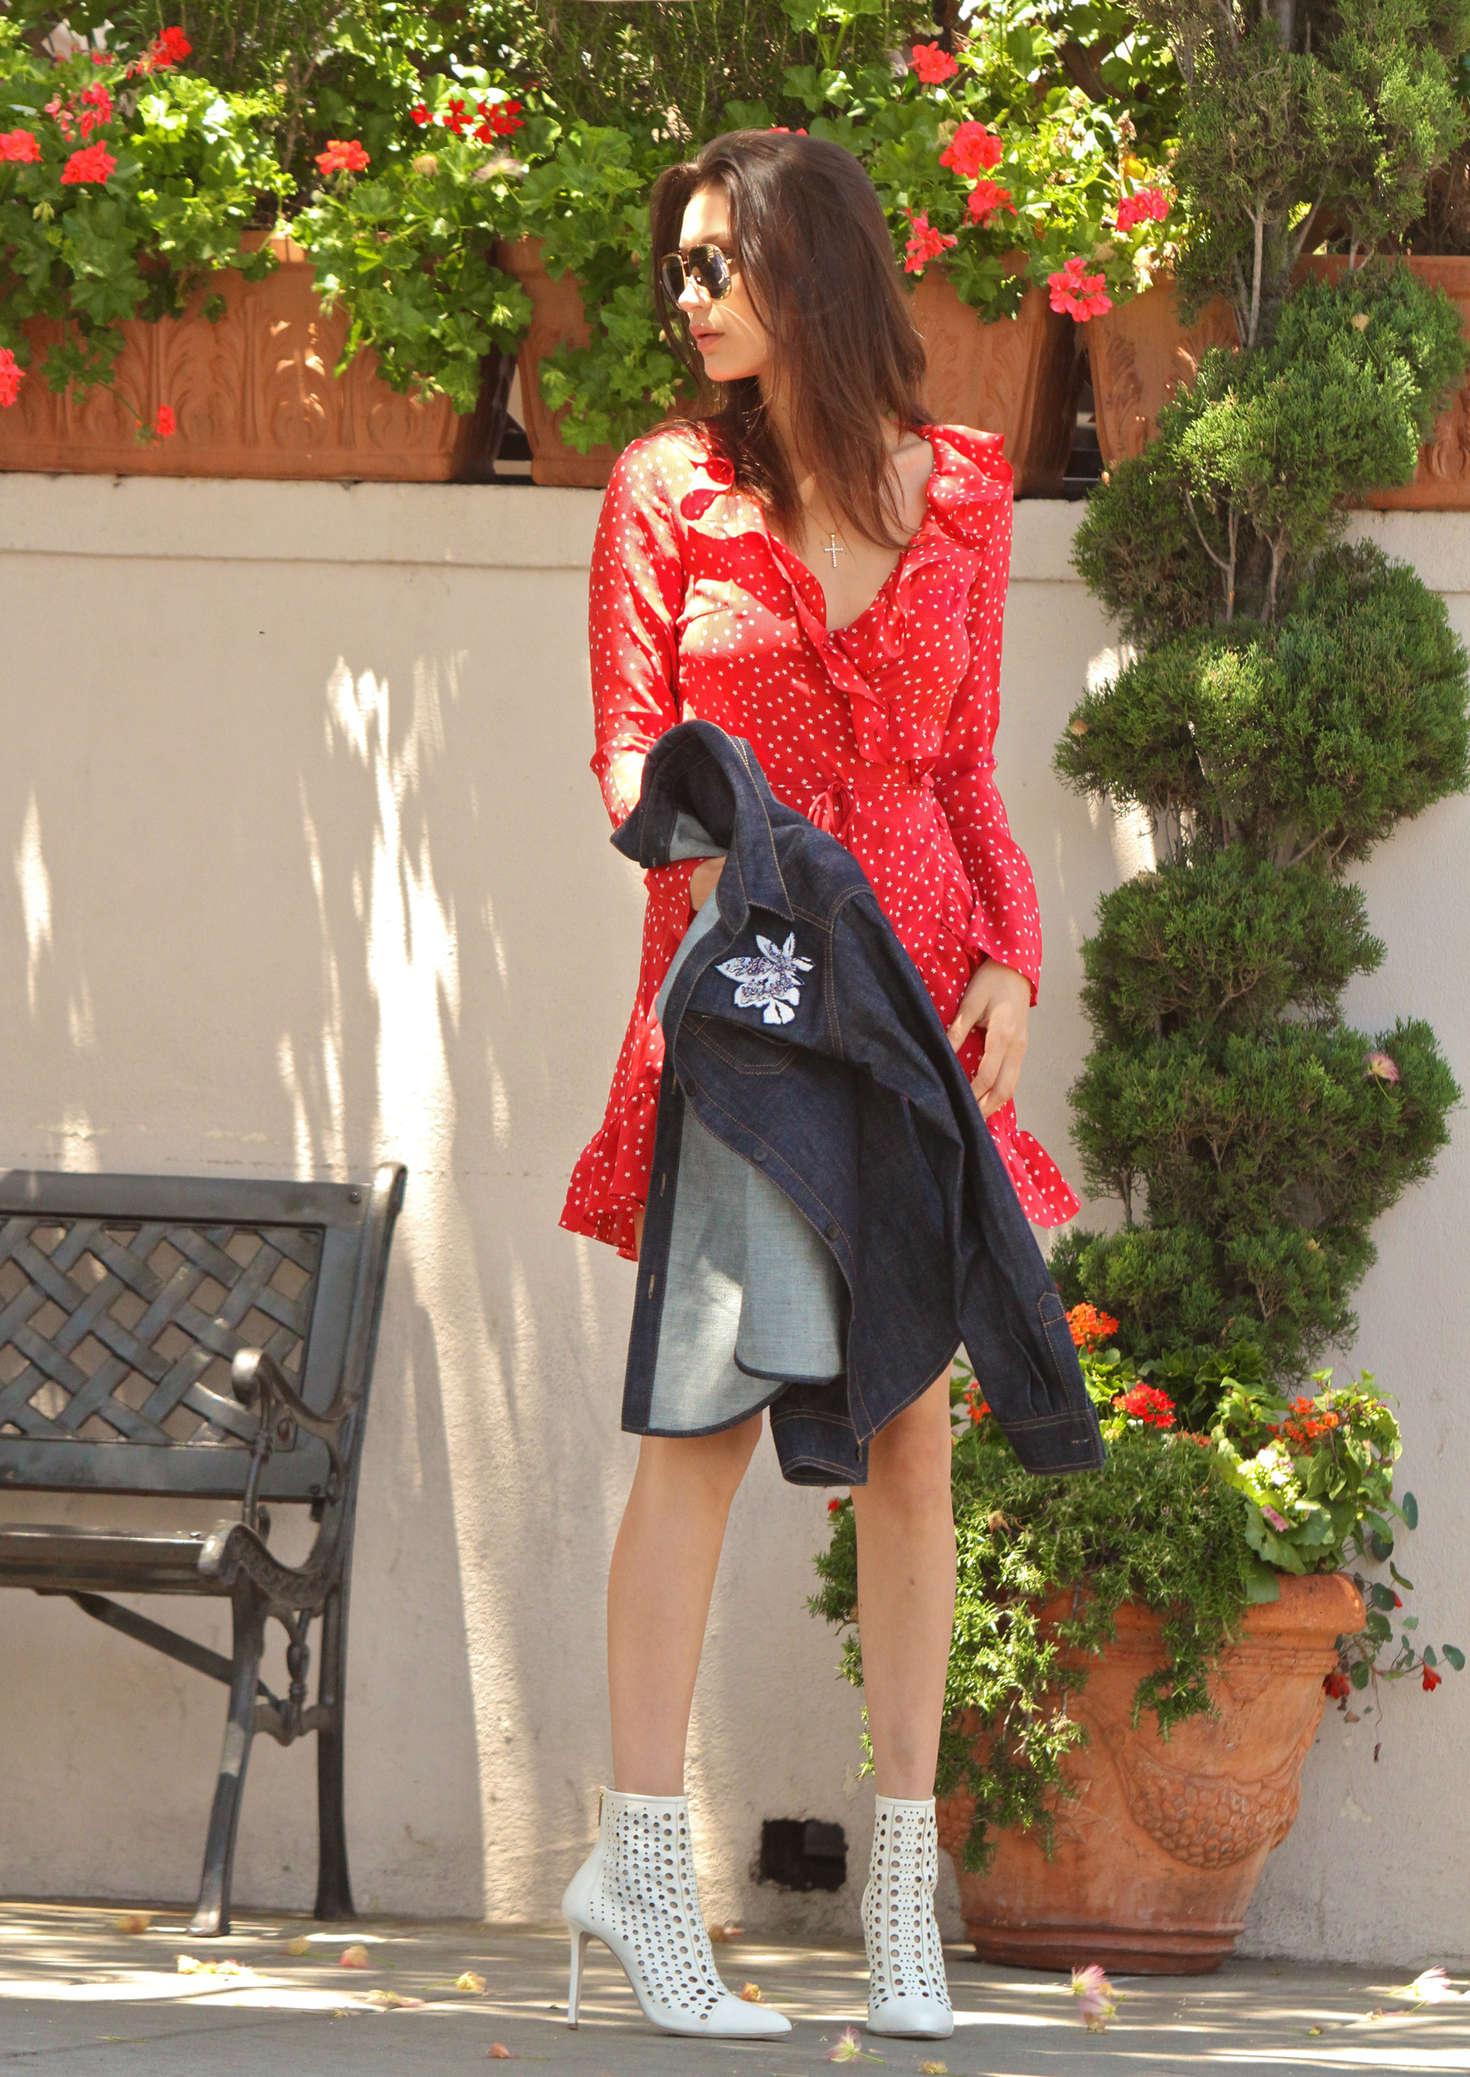 Bella Hadid 2016 : Bella Hadid in Red Mini Dress -22